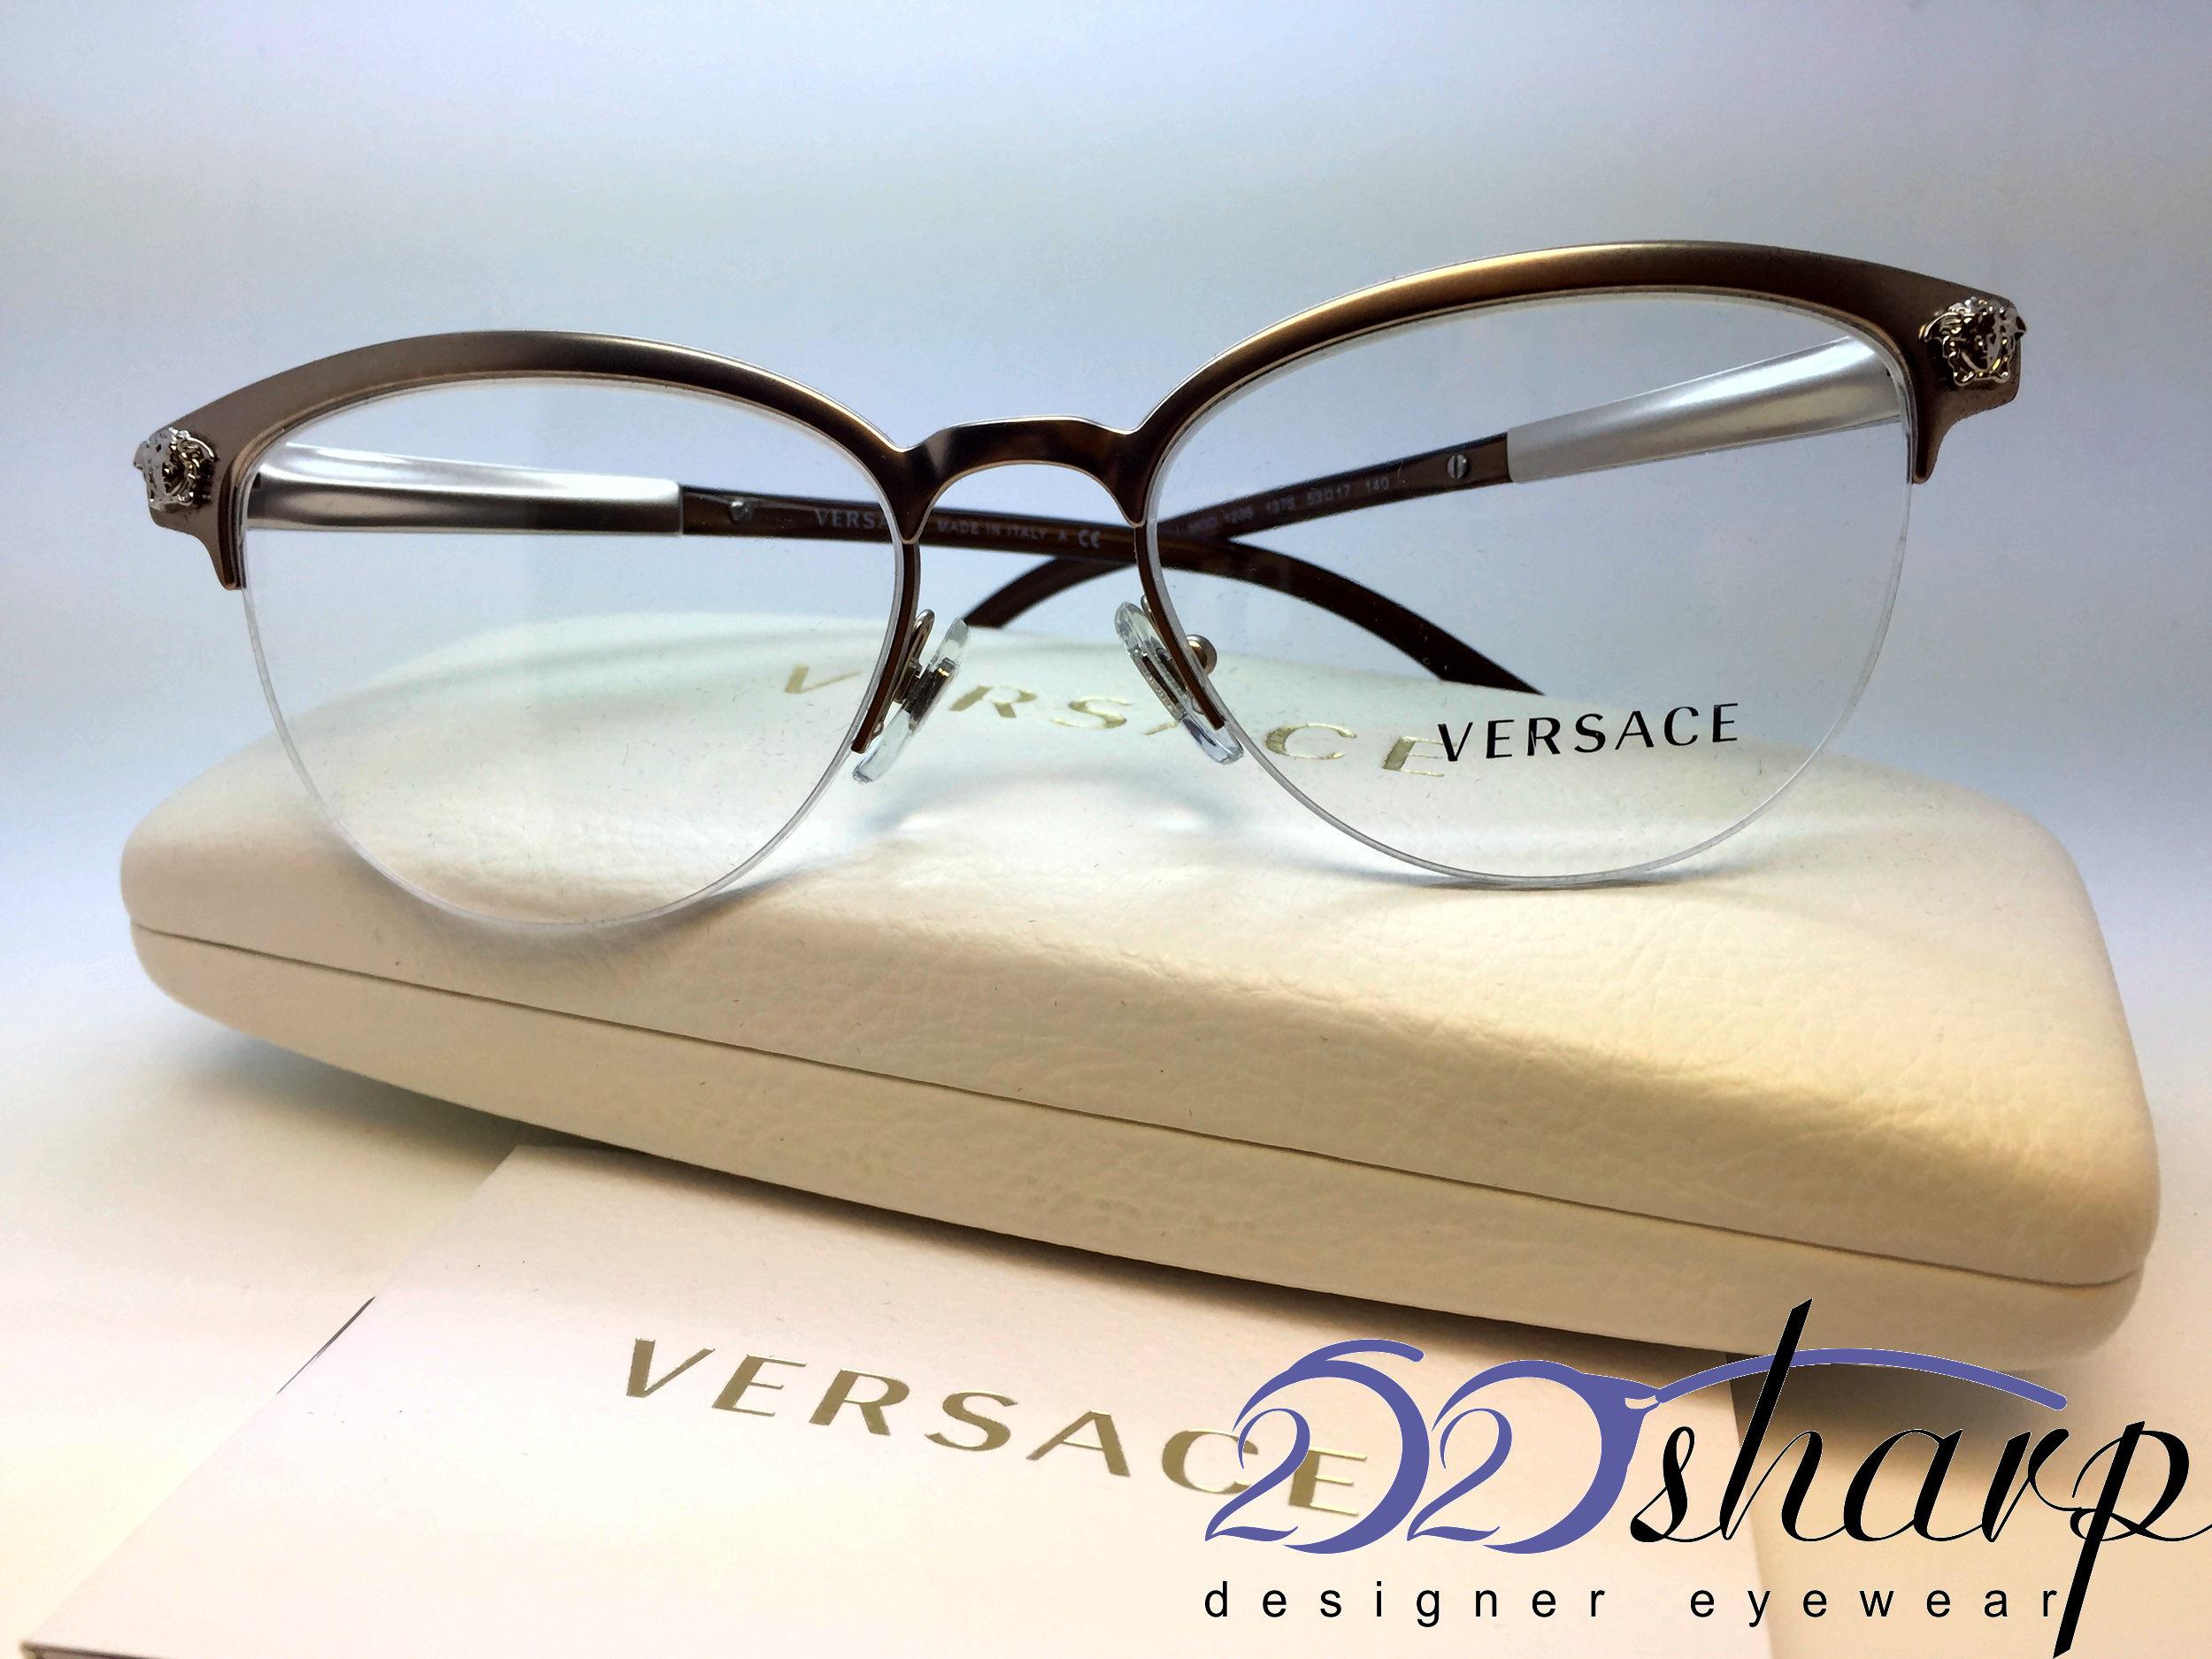 b51bf5b232 Versace Eyeglasses-OVE 1235 1375 53 Gold